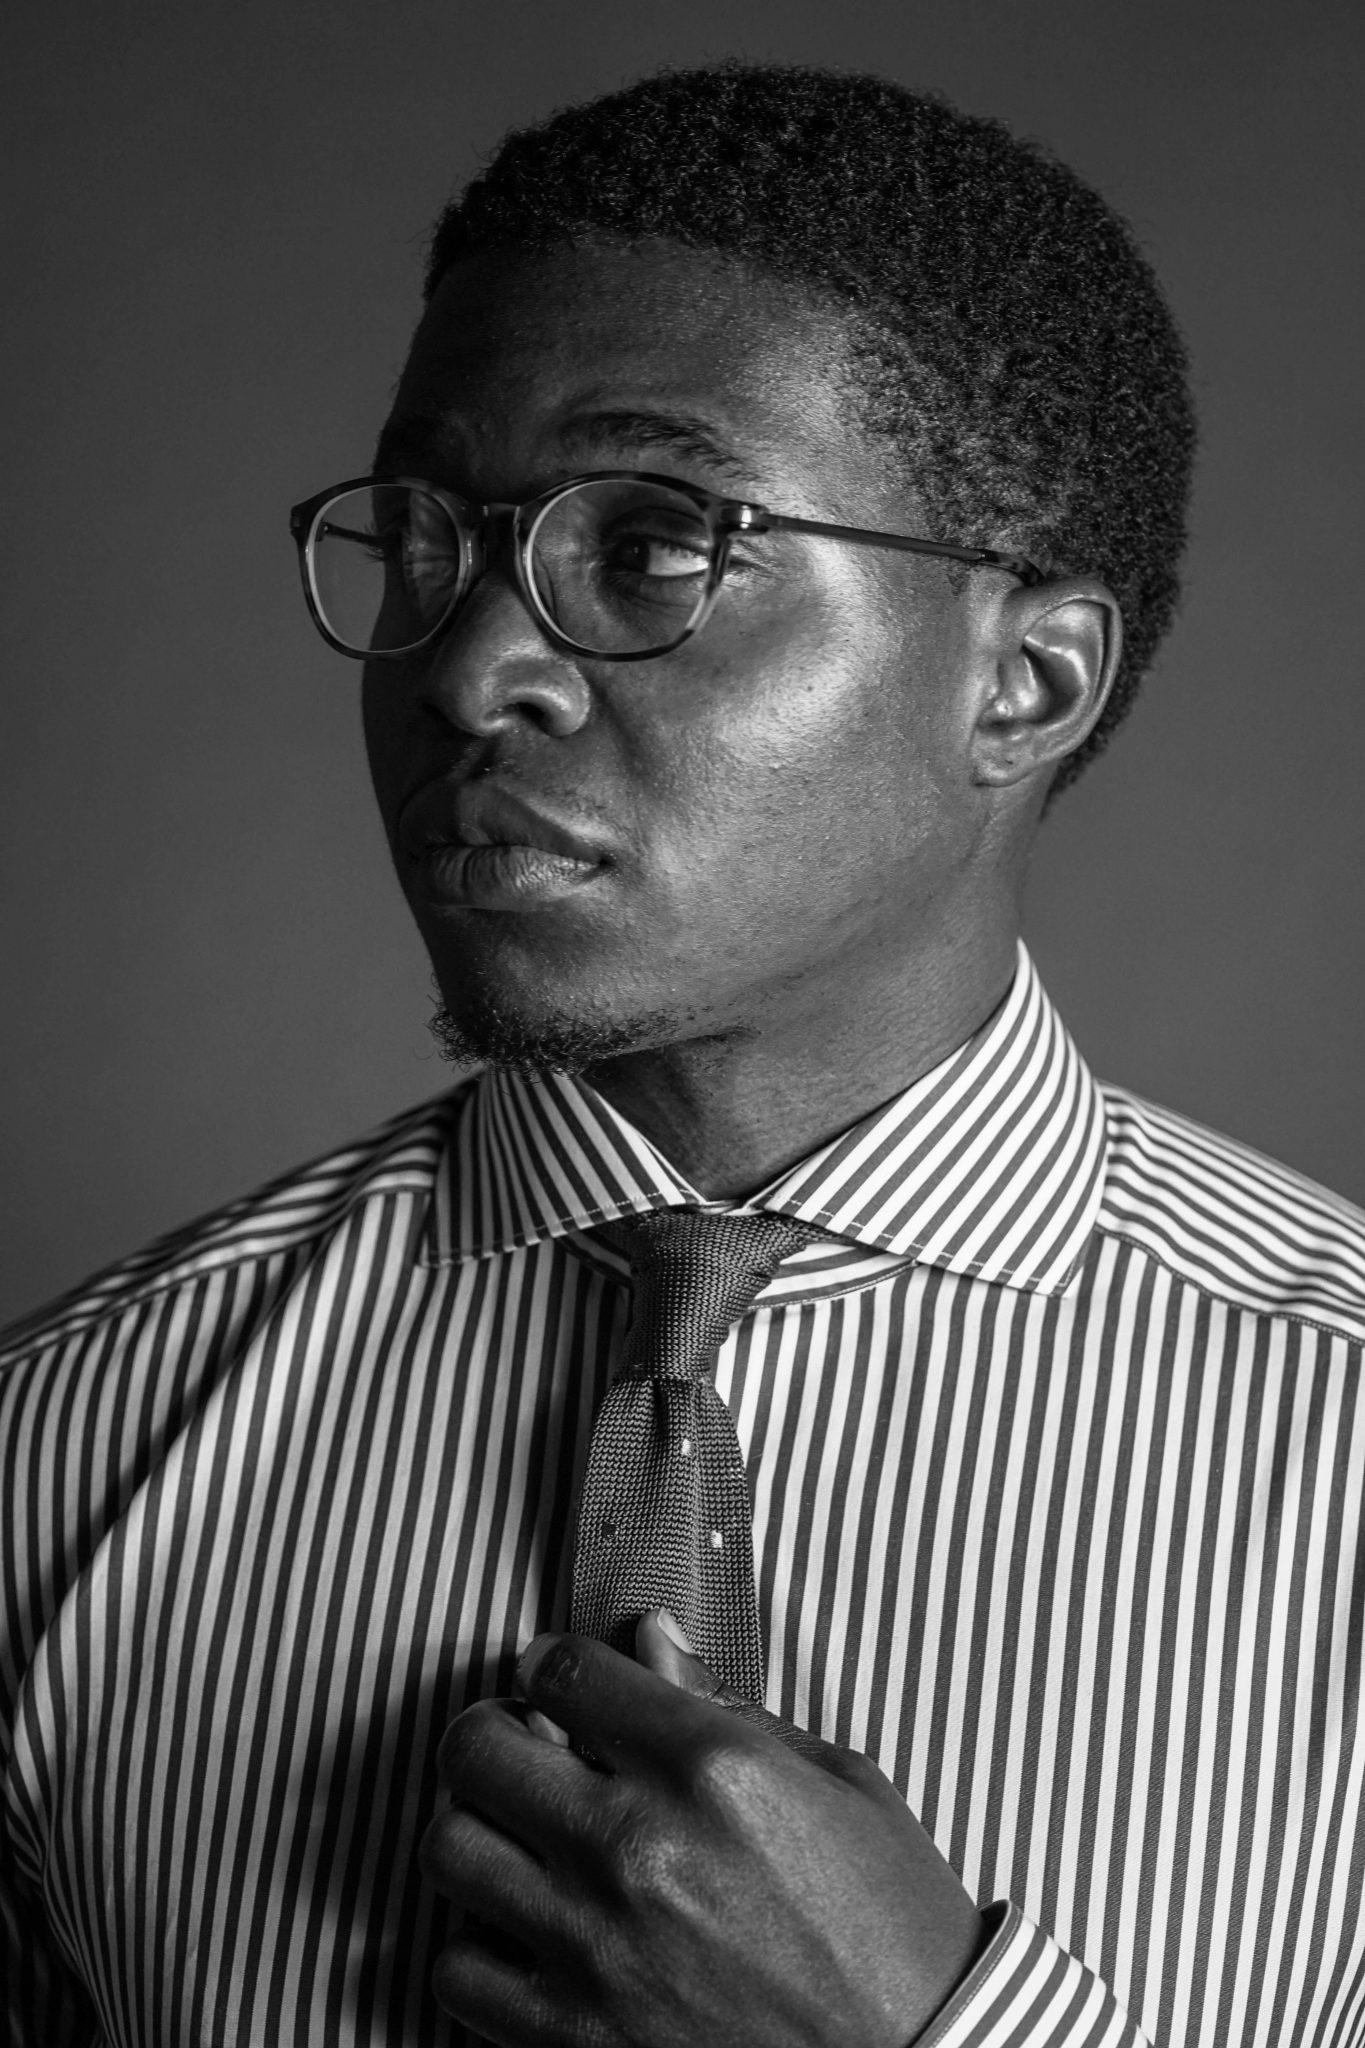 Dapper-Advisor-Akil-McLeod-black-man-african-american-portrait-soxfords-tie-stripe-shirt-knit-tie-smile